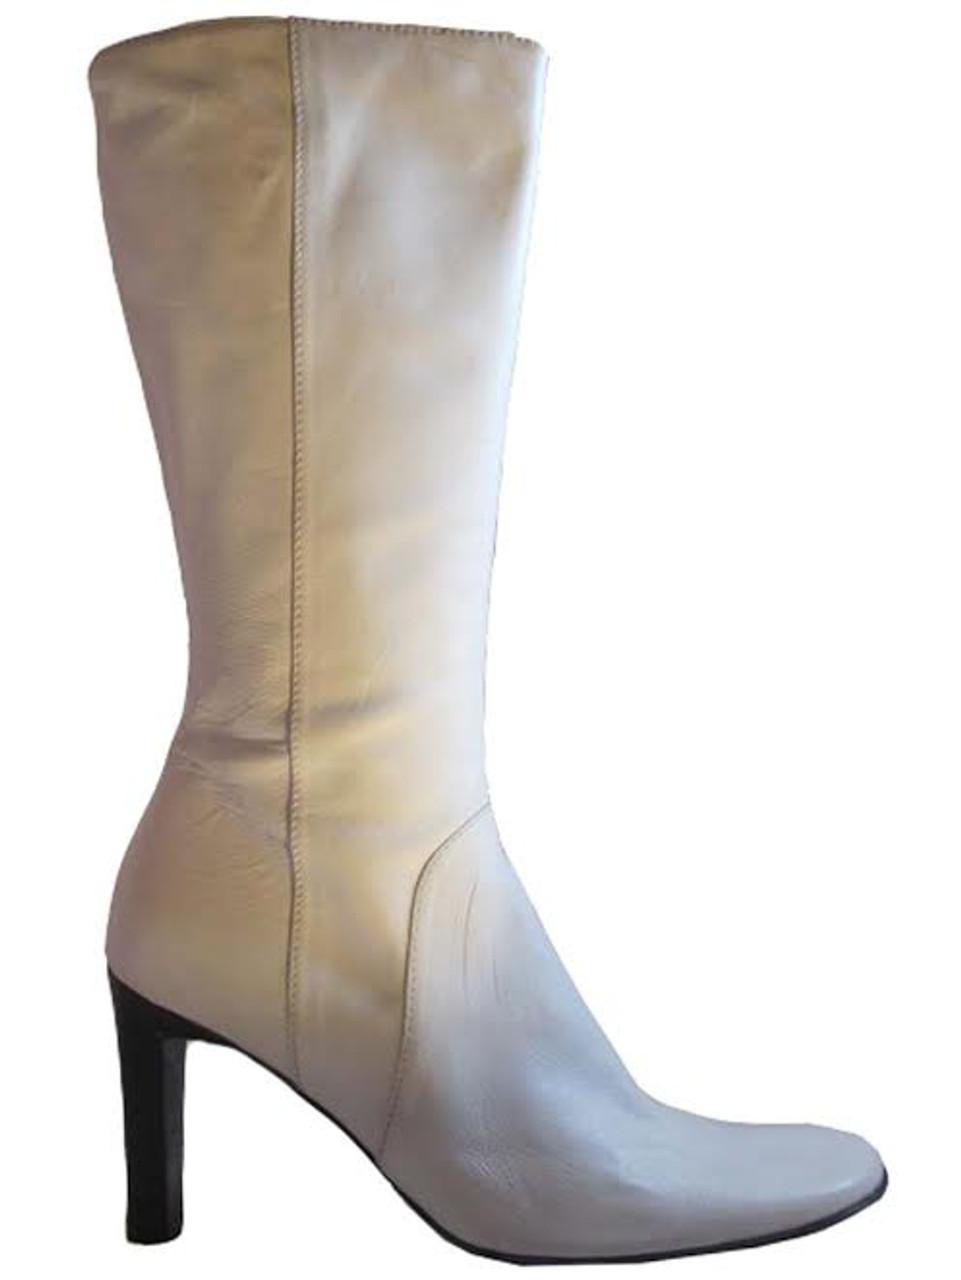 Mid Calf high Heel Boots 4163 White